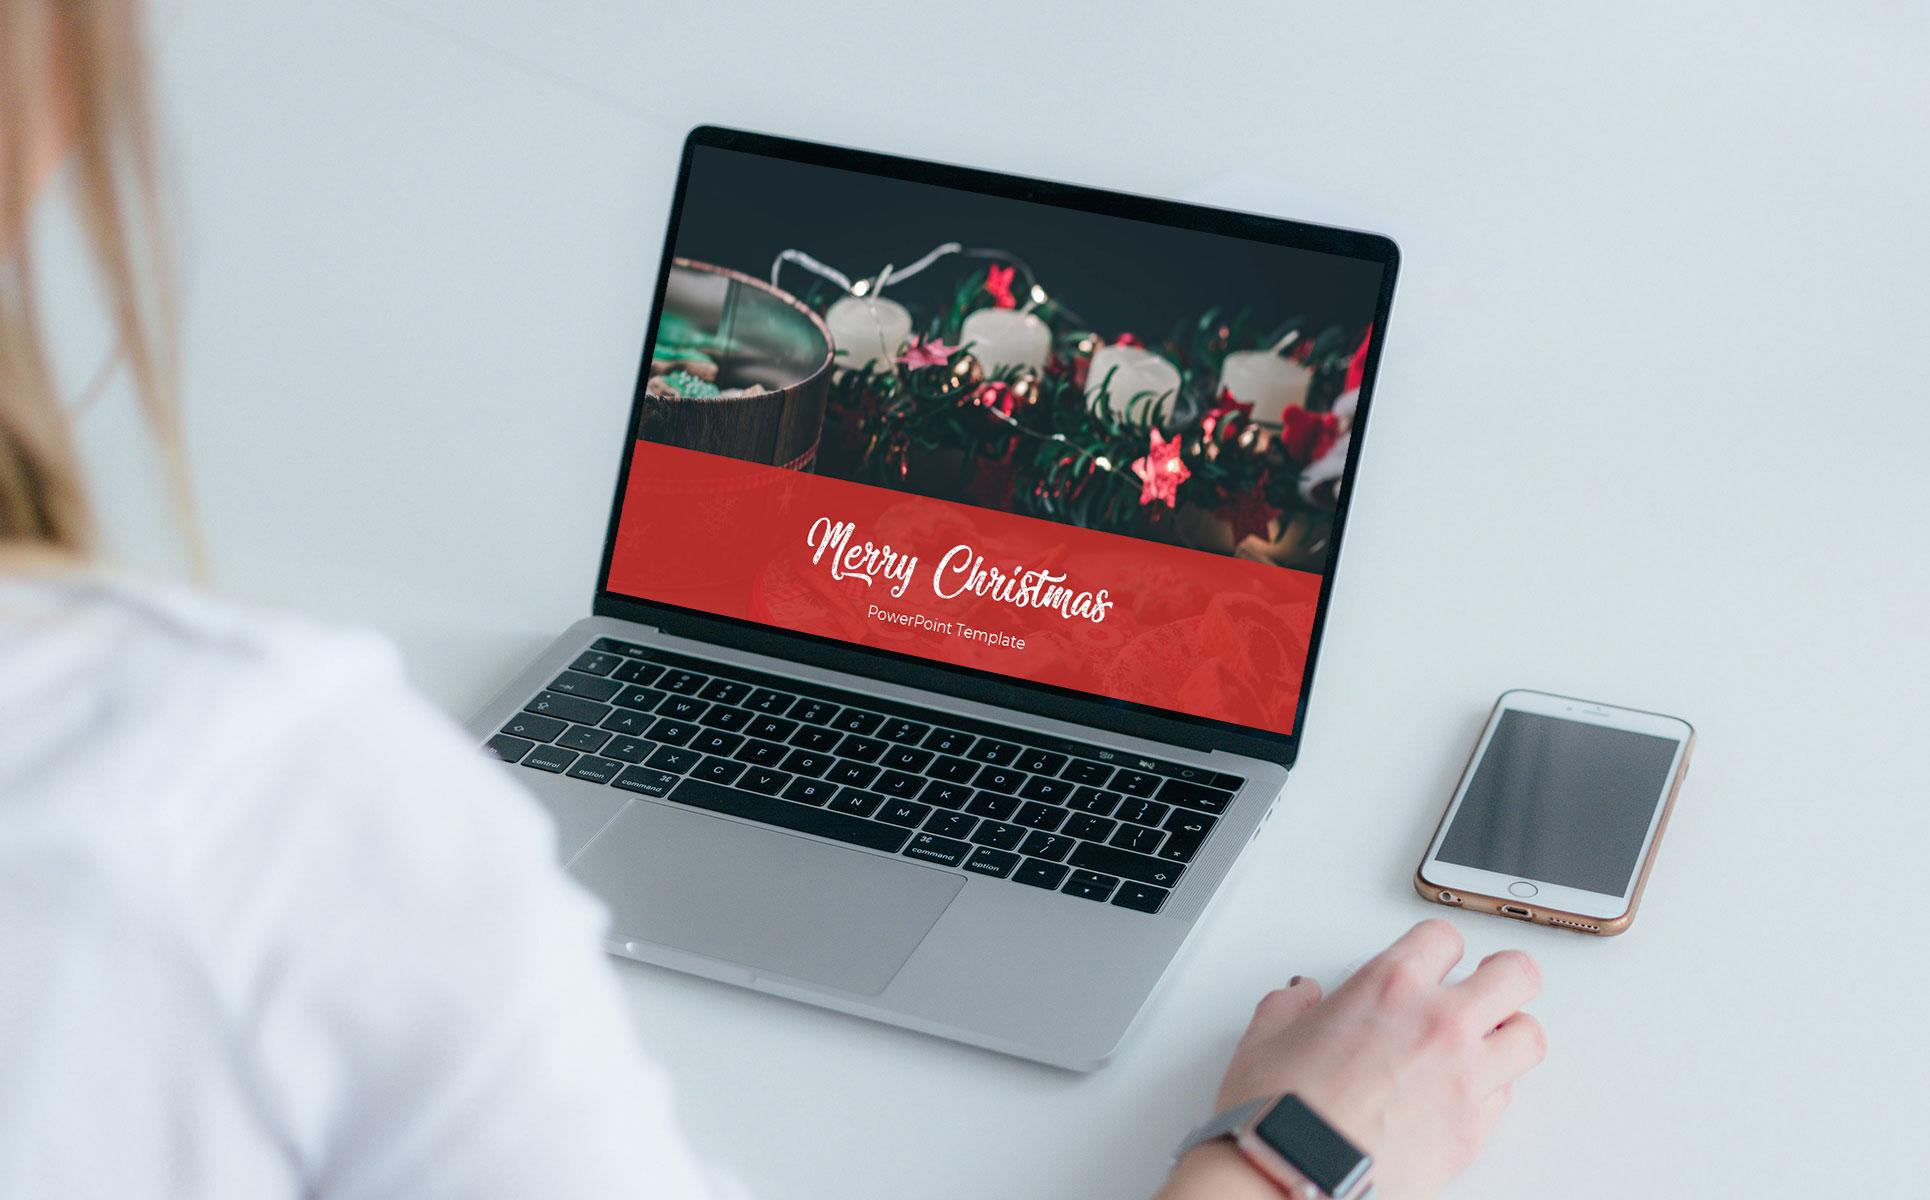 Merry Christmas Powerpoint Presentation Template mockup laptop.